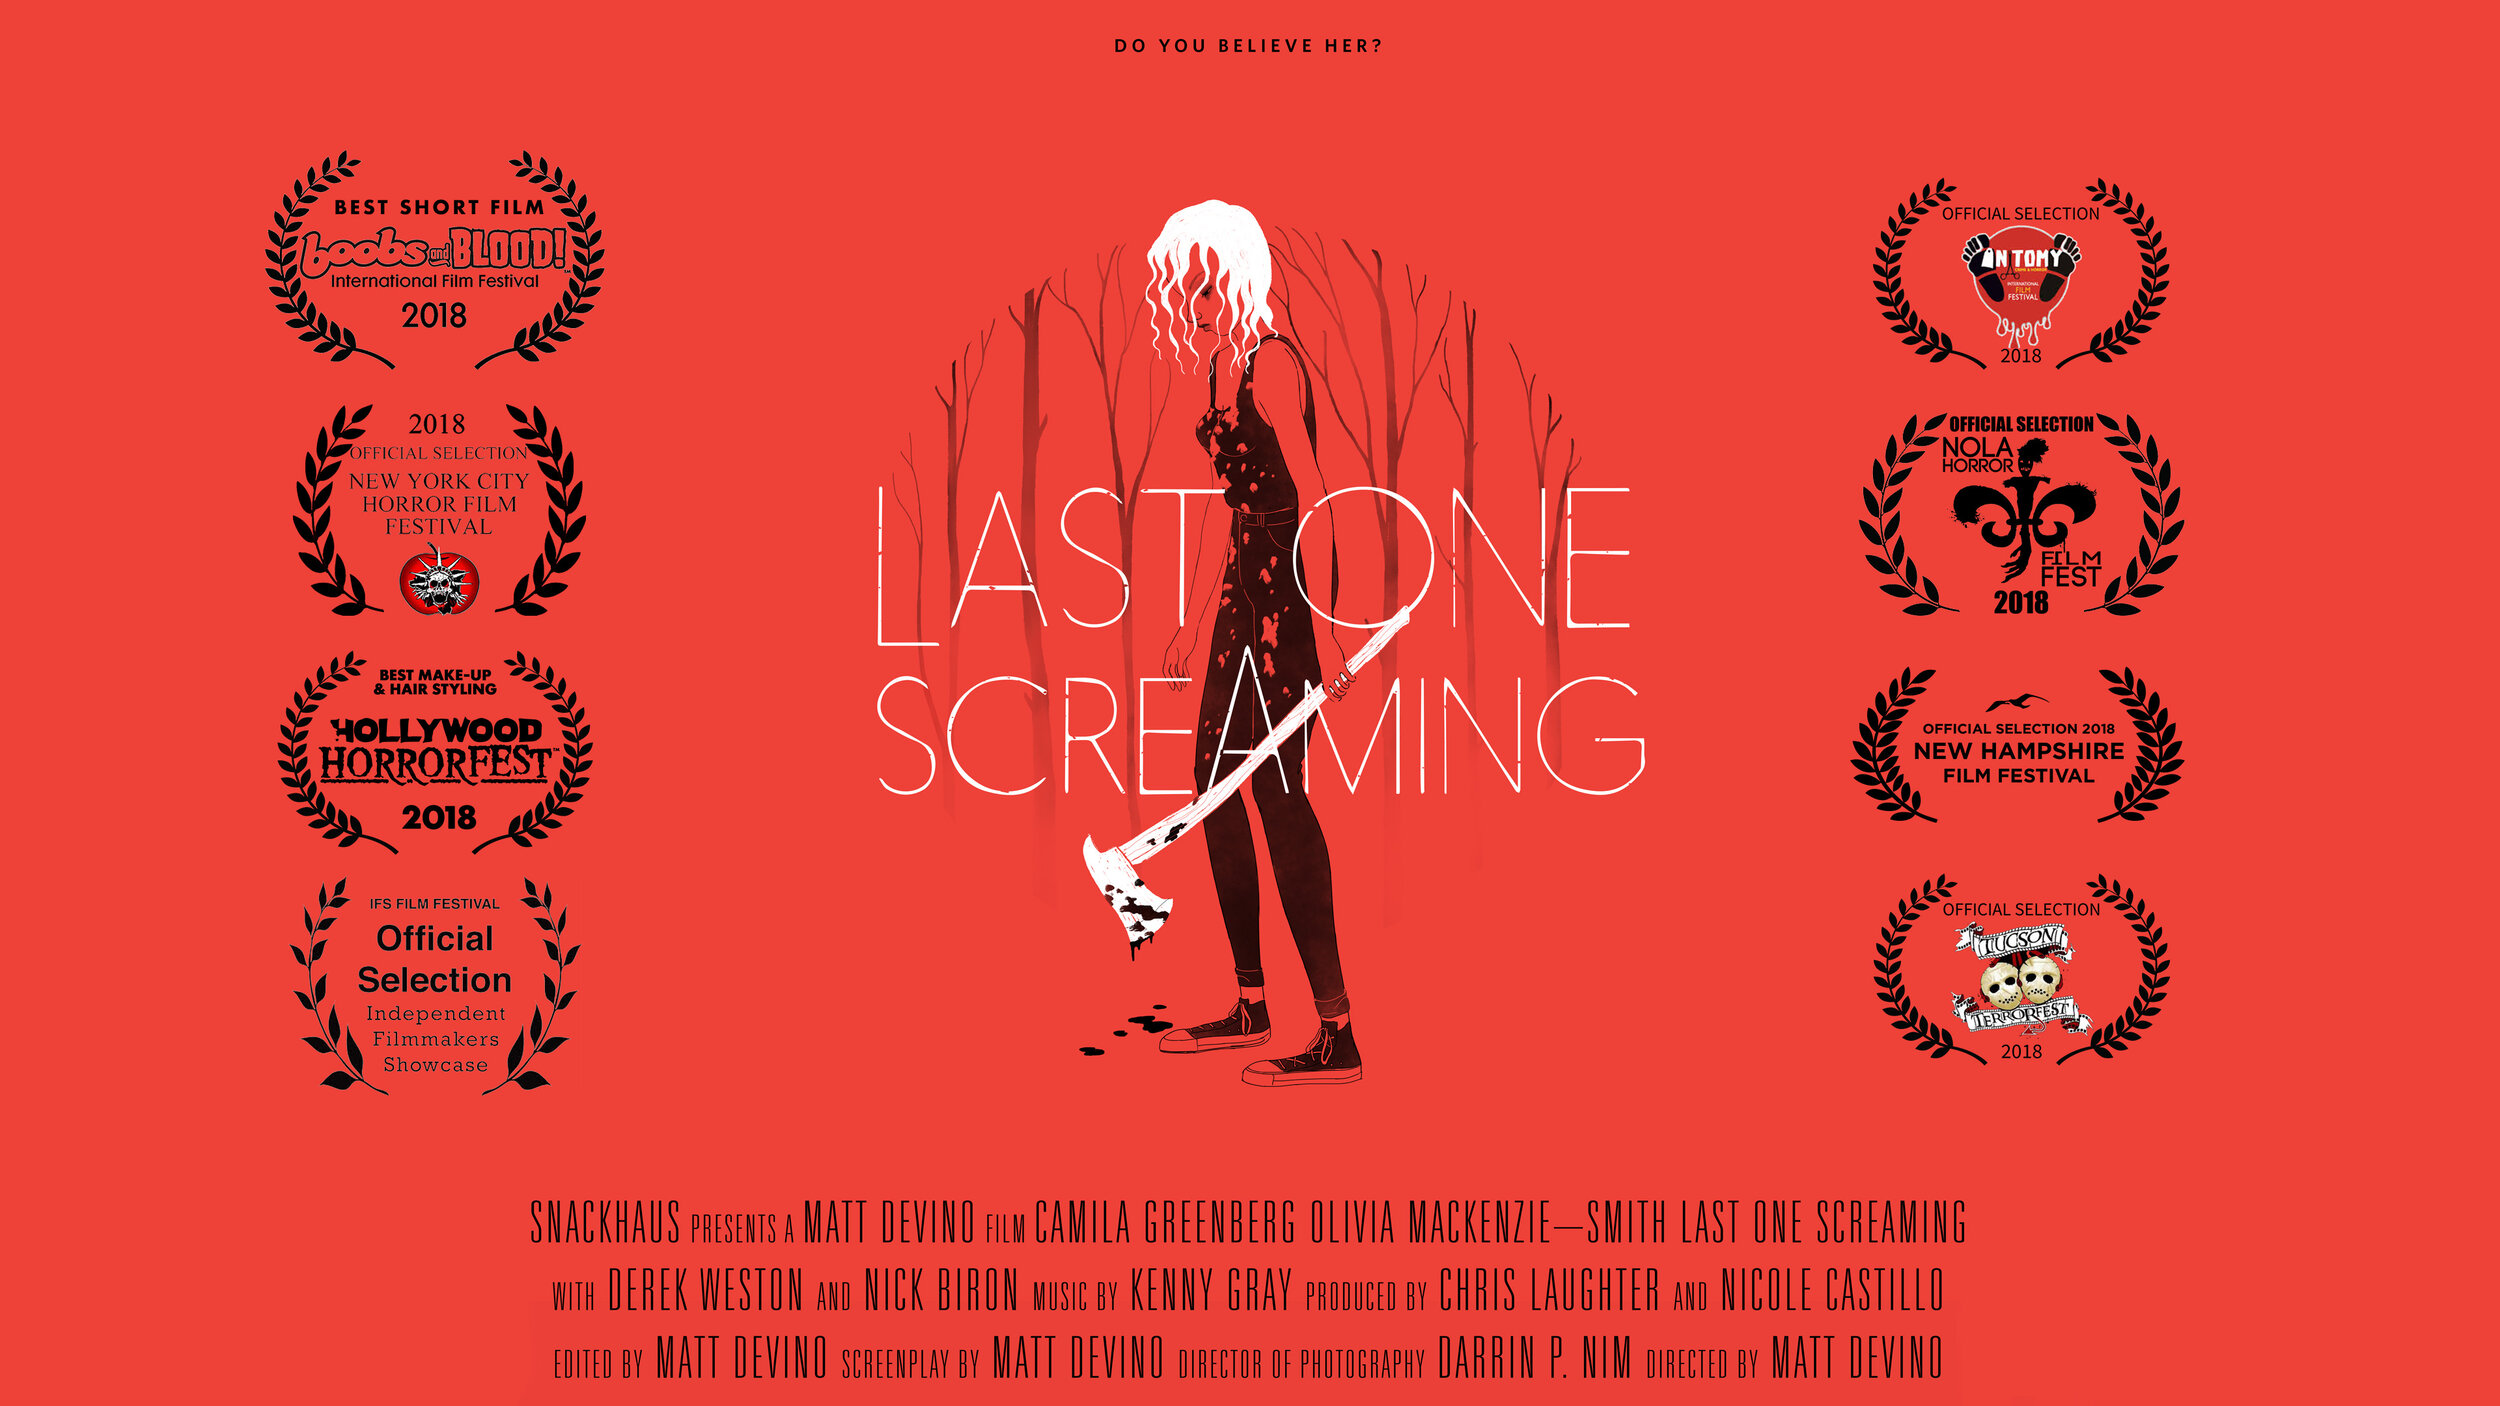 Last One Screaming Steph-poster16x9.jpg